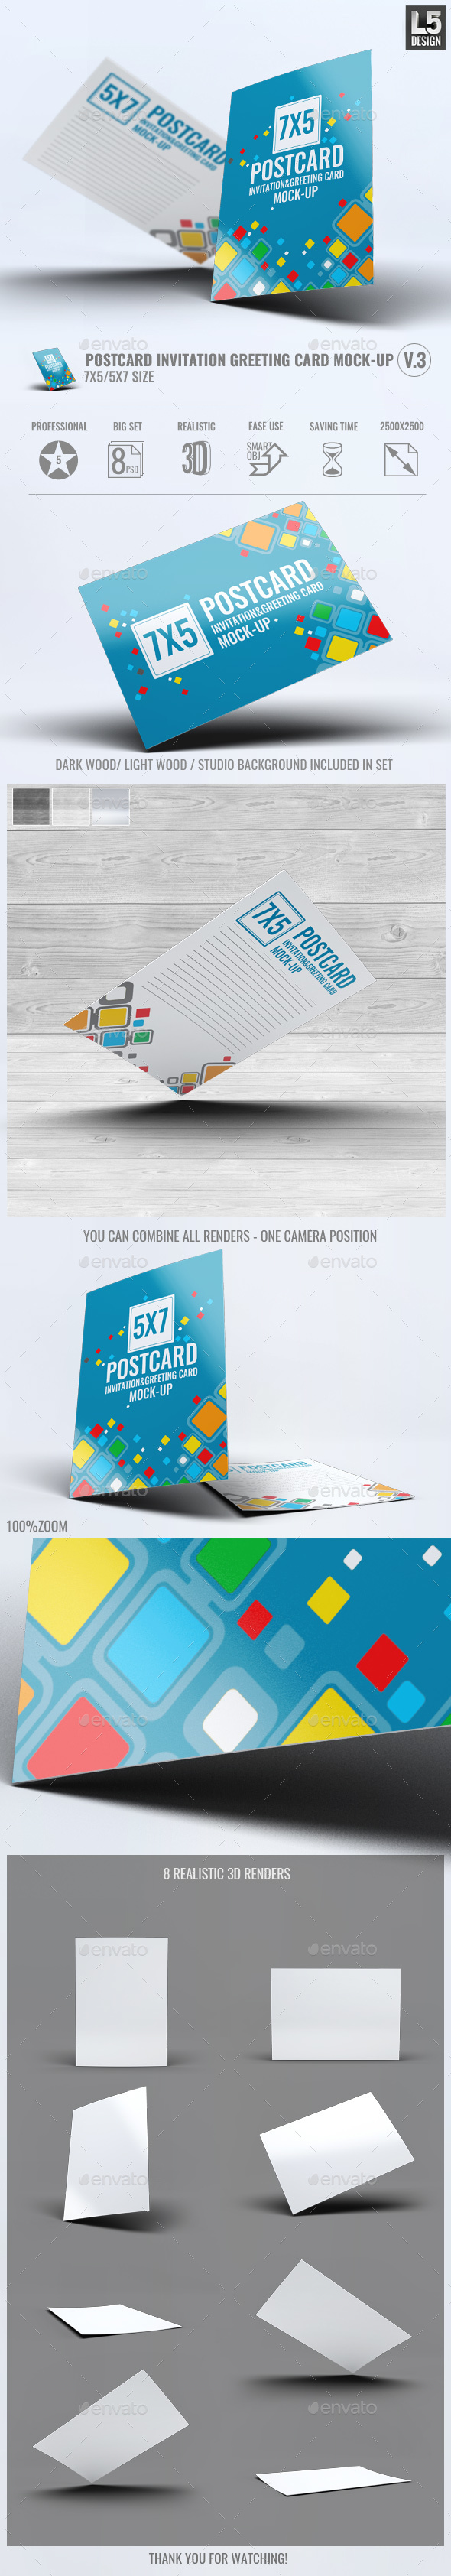 Postcard Invitation Greeting Card Mock Up V3 By L5design Graphicriver